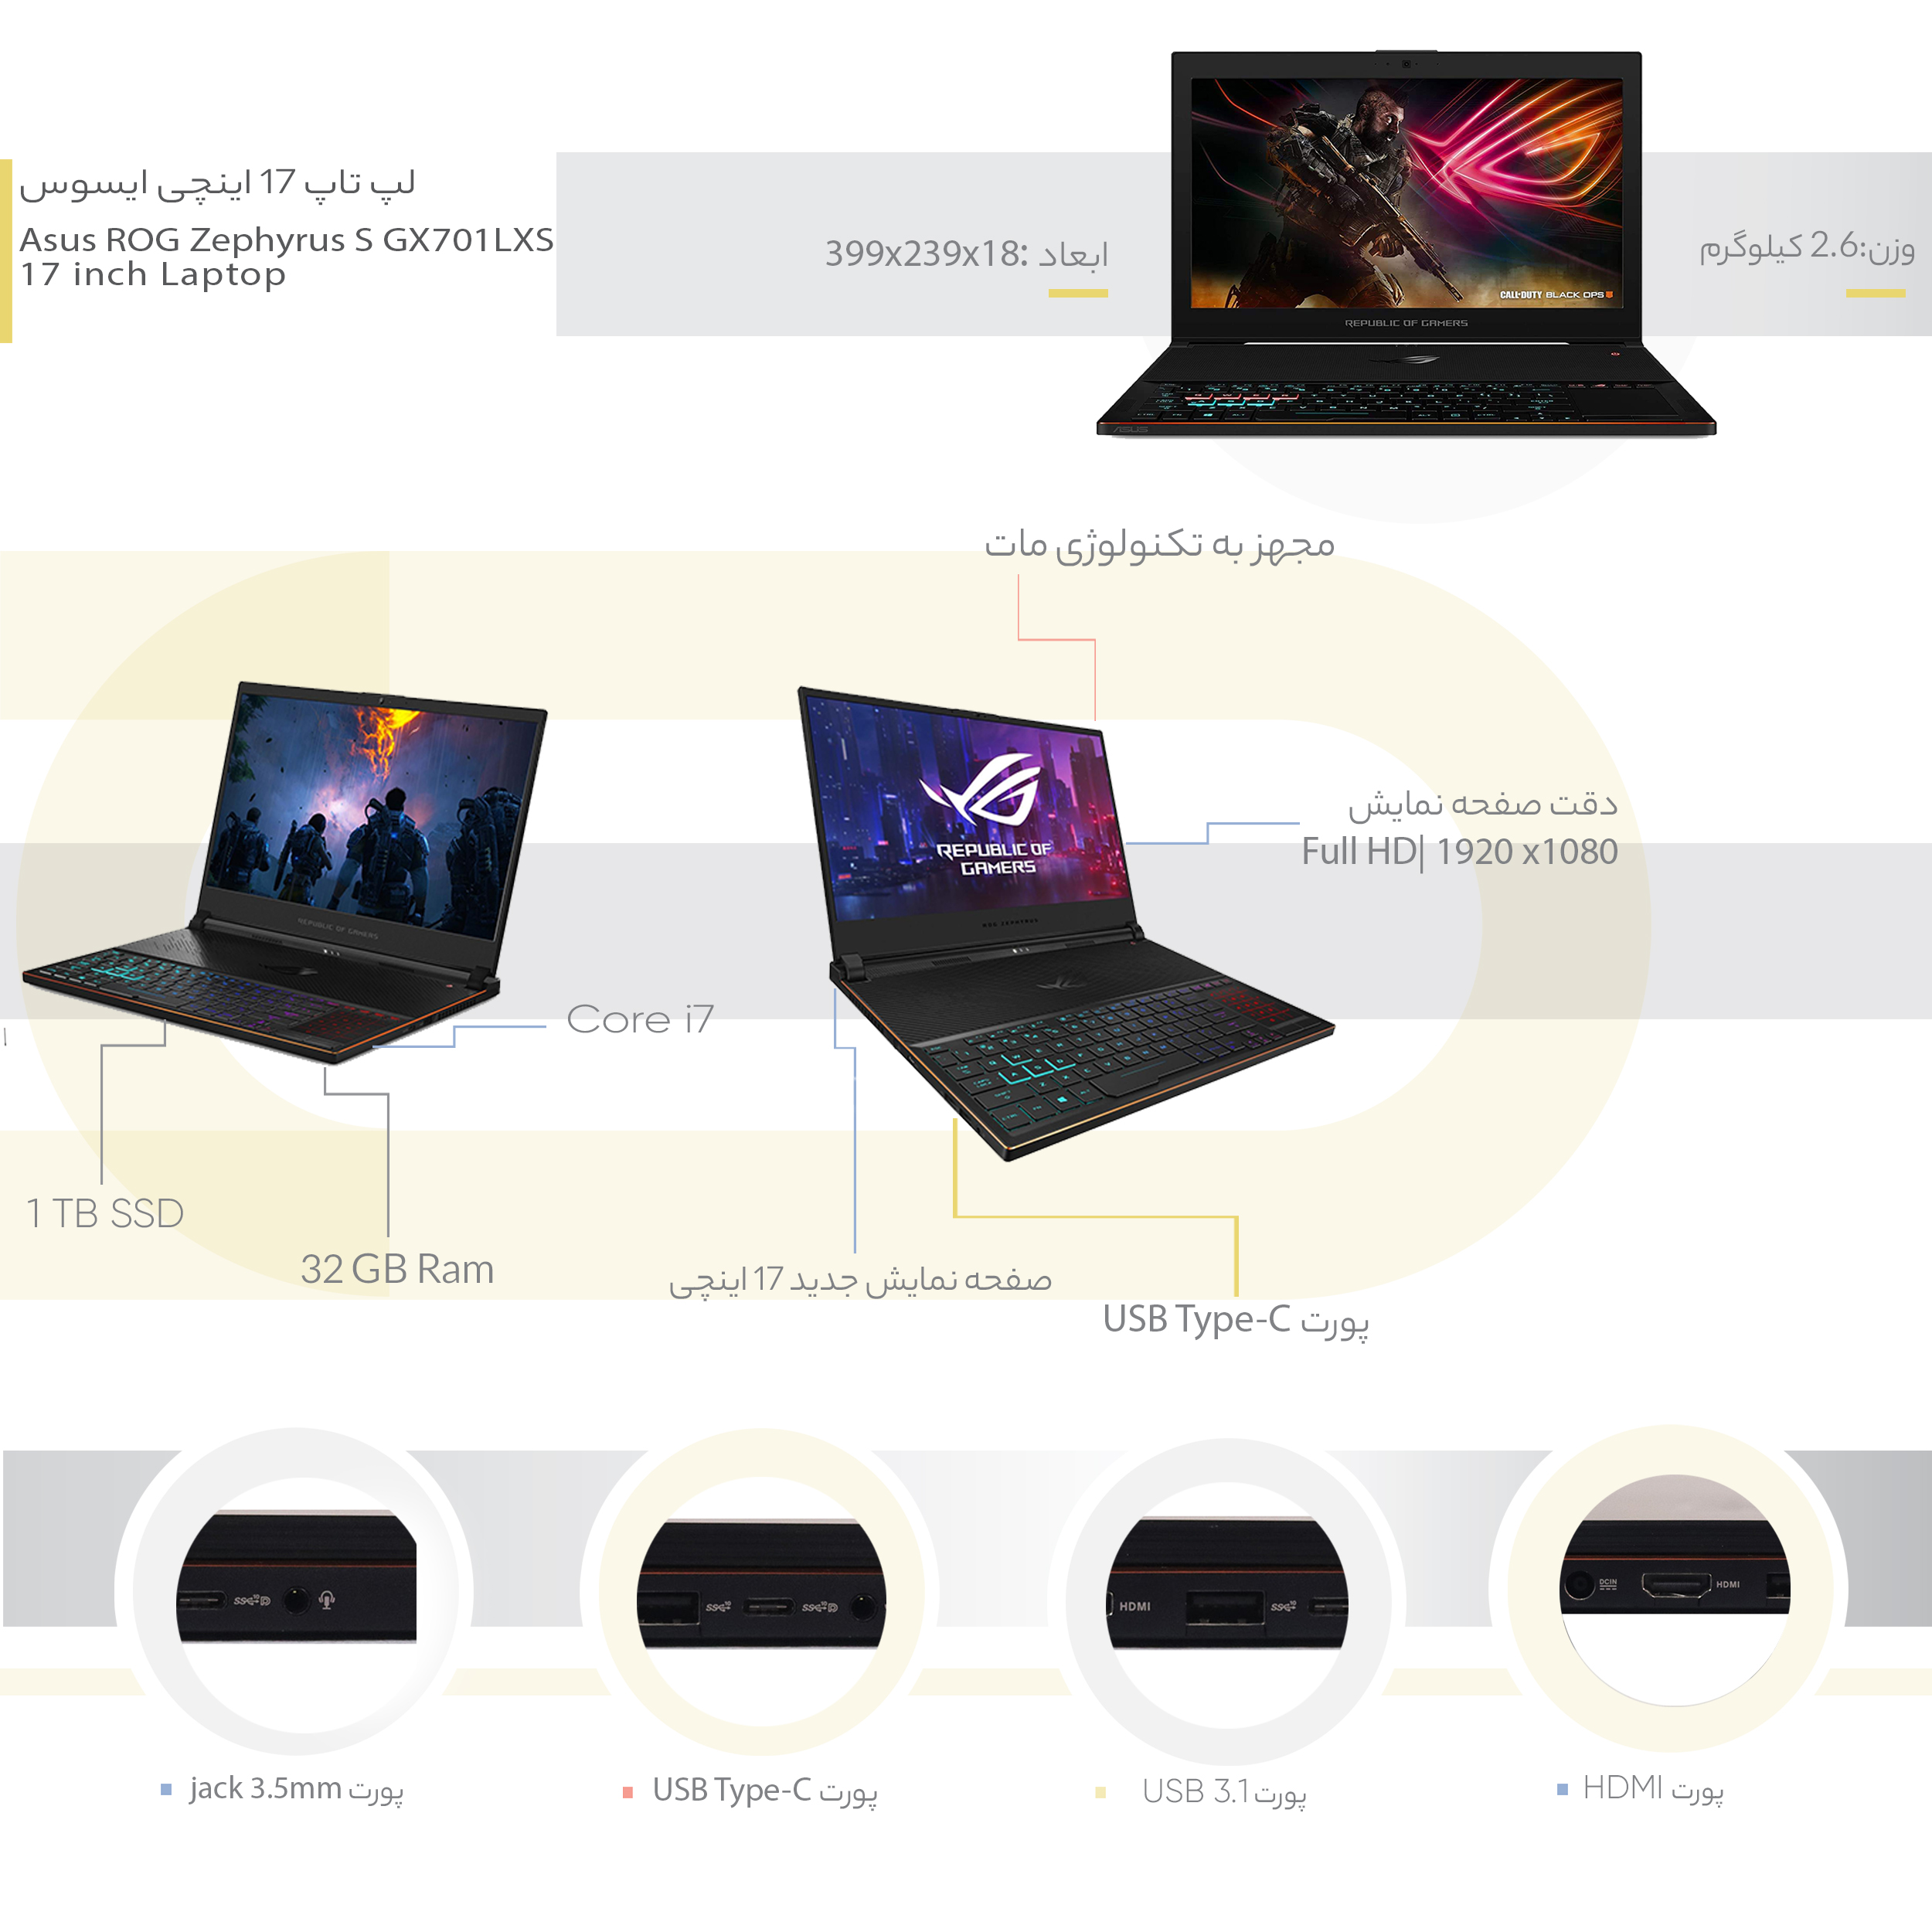 لپ تاپ 17 اینچی ایسوس مدل  ROG Zephyrus S GX701LXS